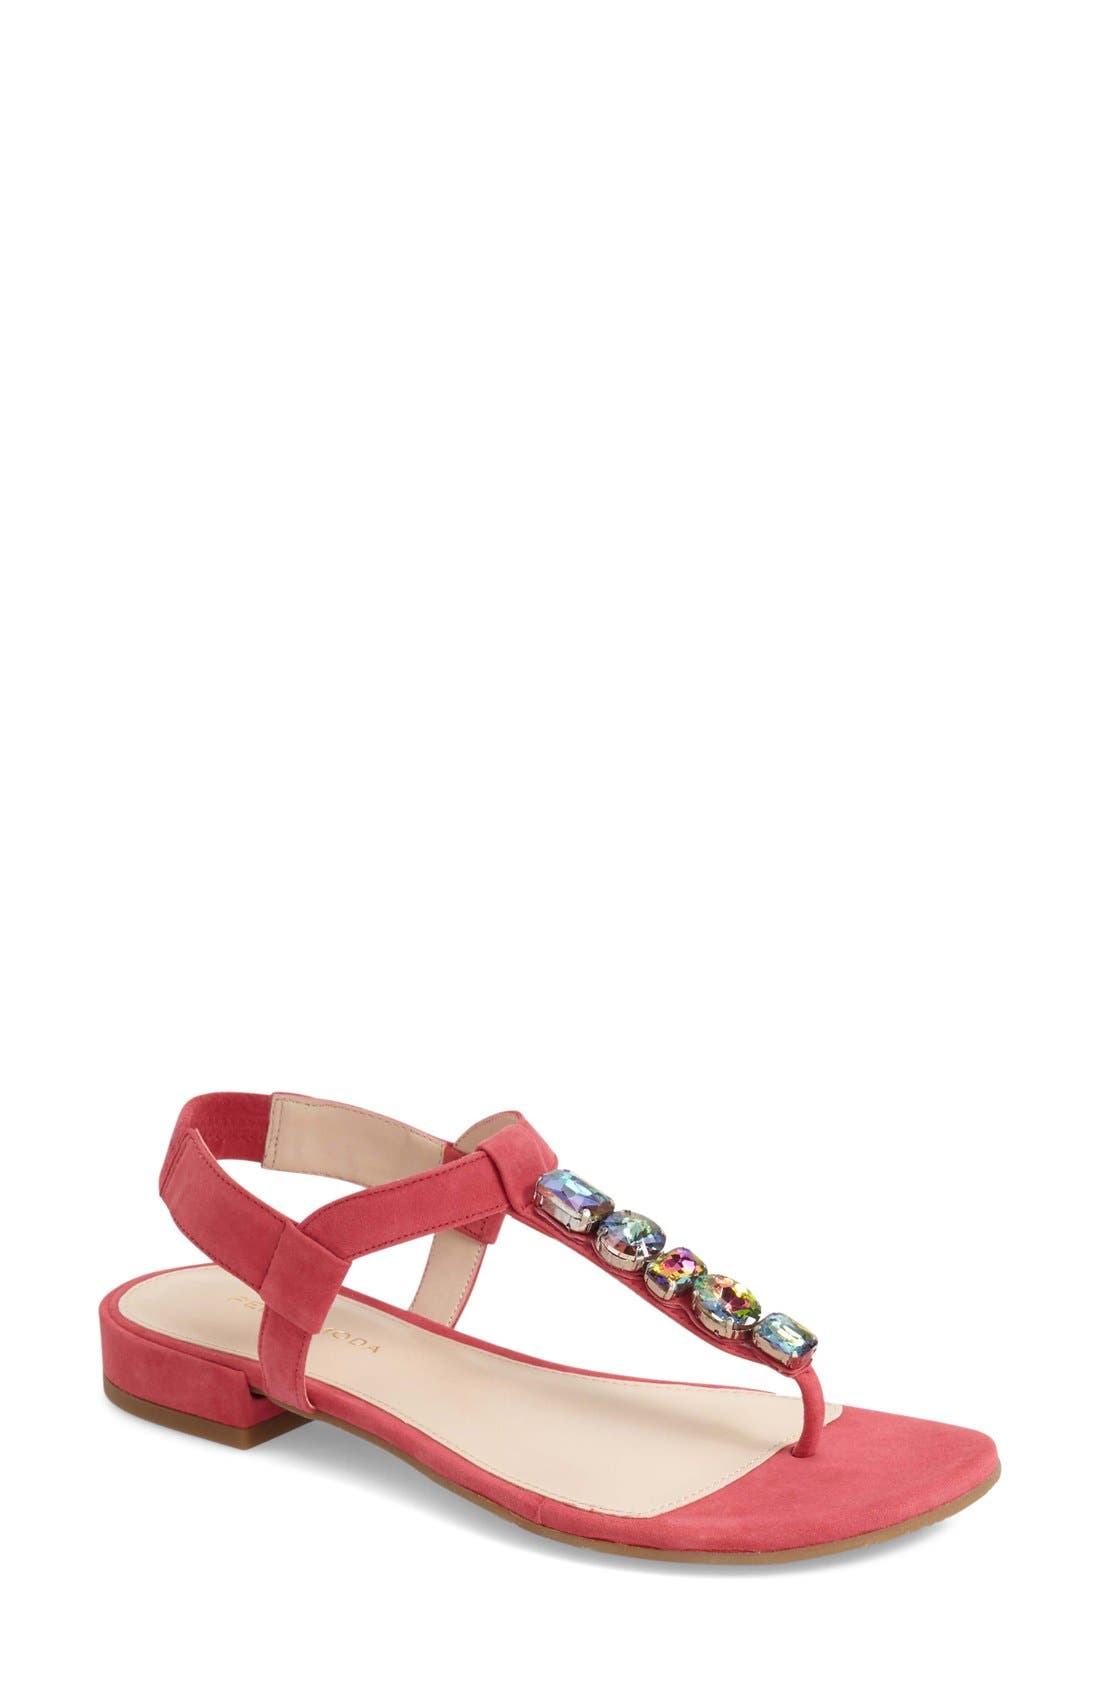 PELLE MODA Venice Sandal